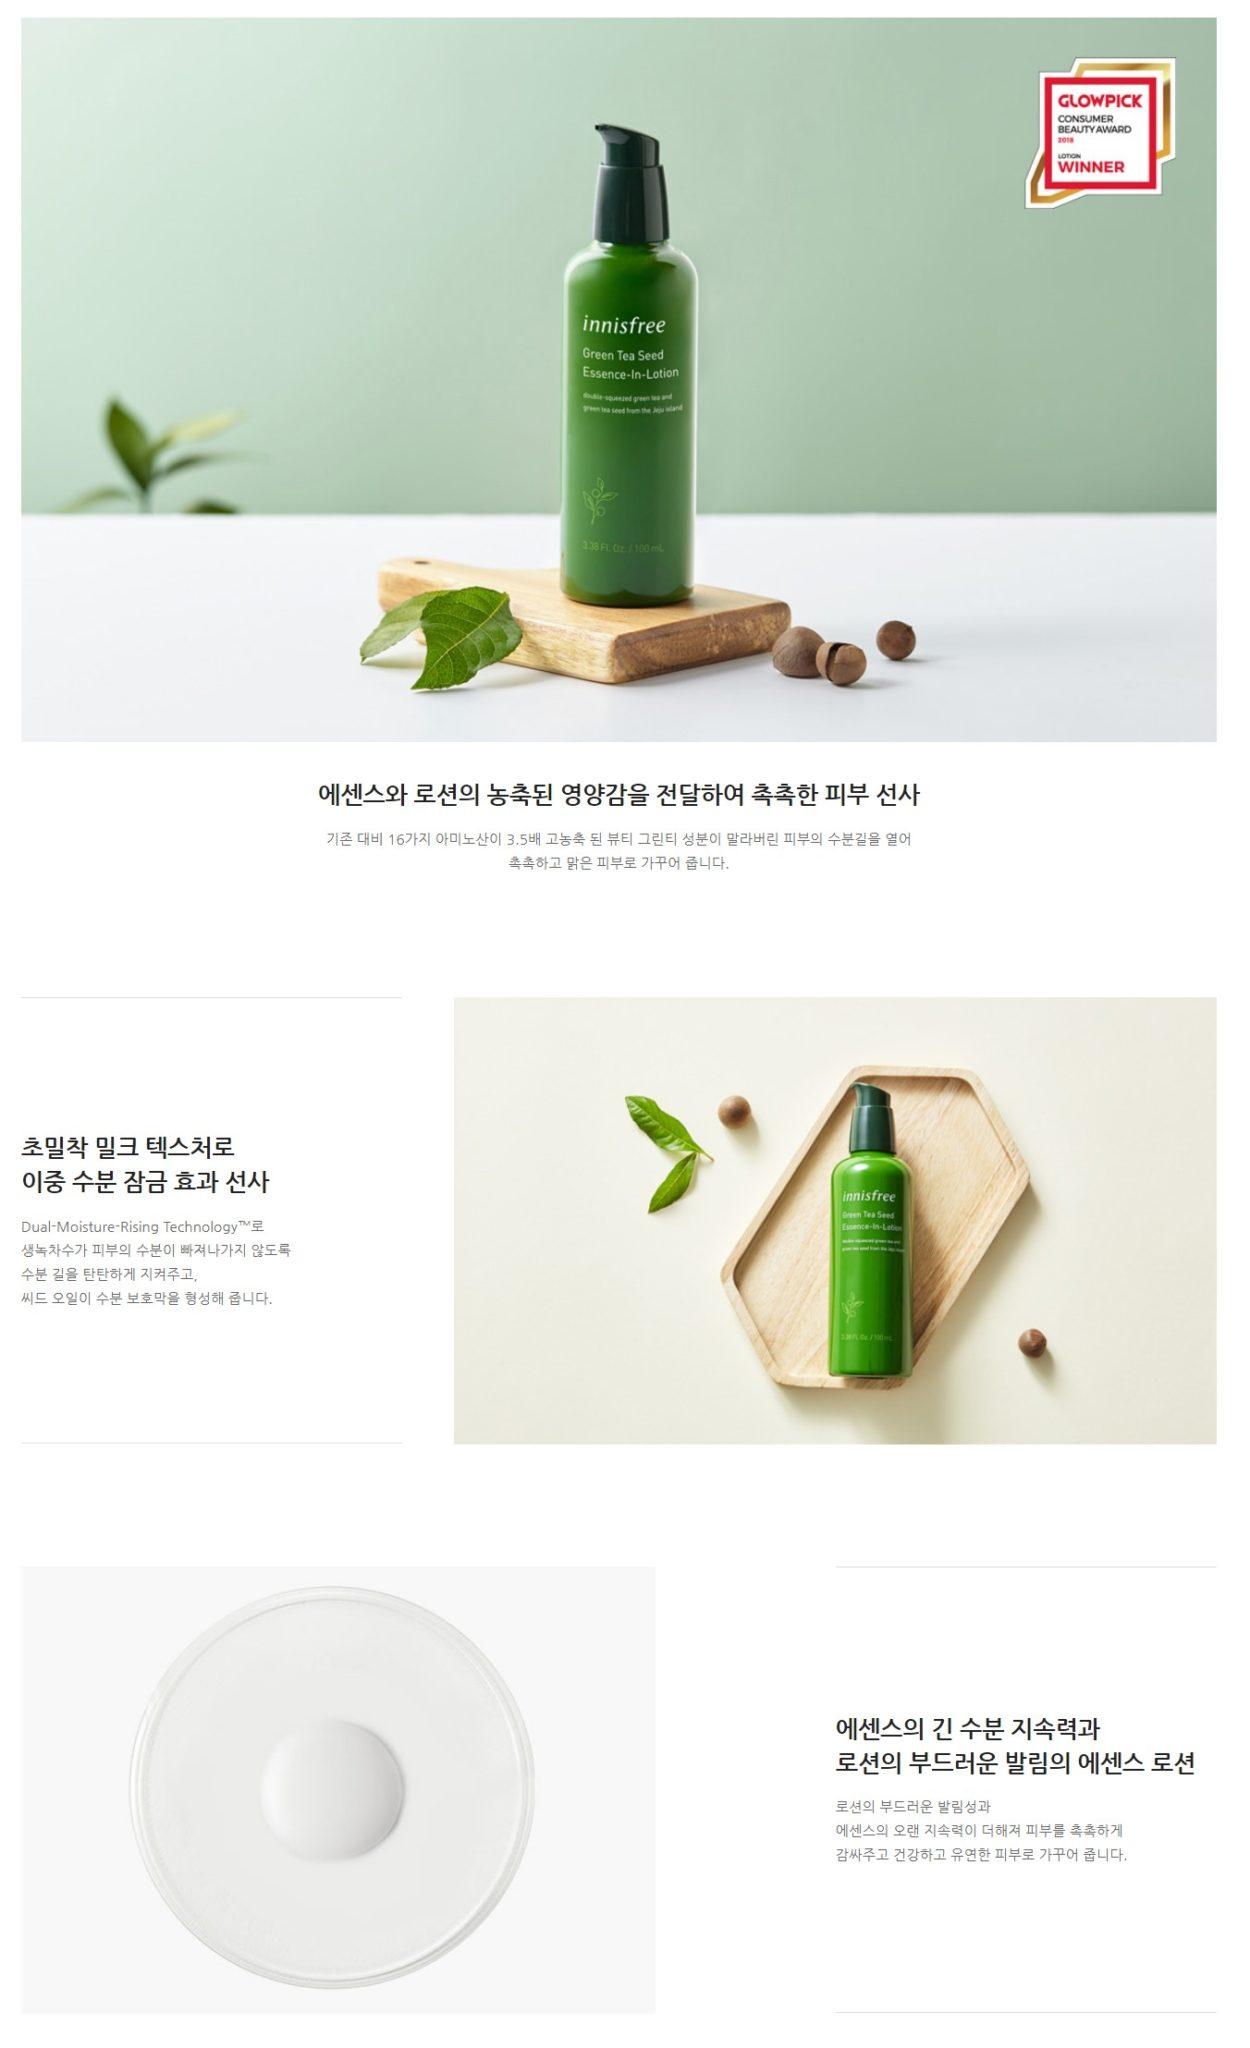 Innisfree Green Tea Seed Essence-In-Lotion (100ml)